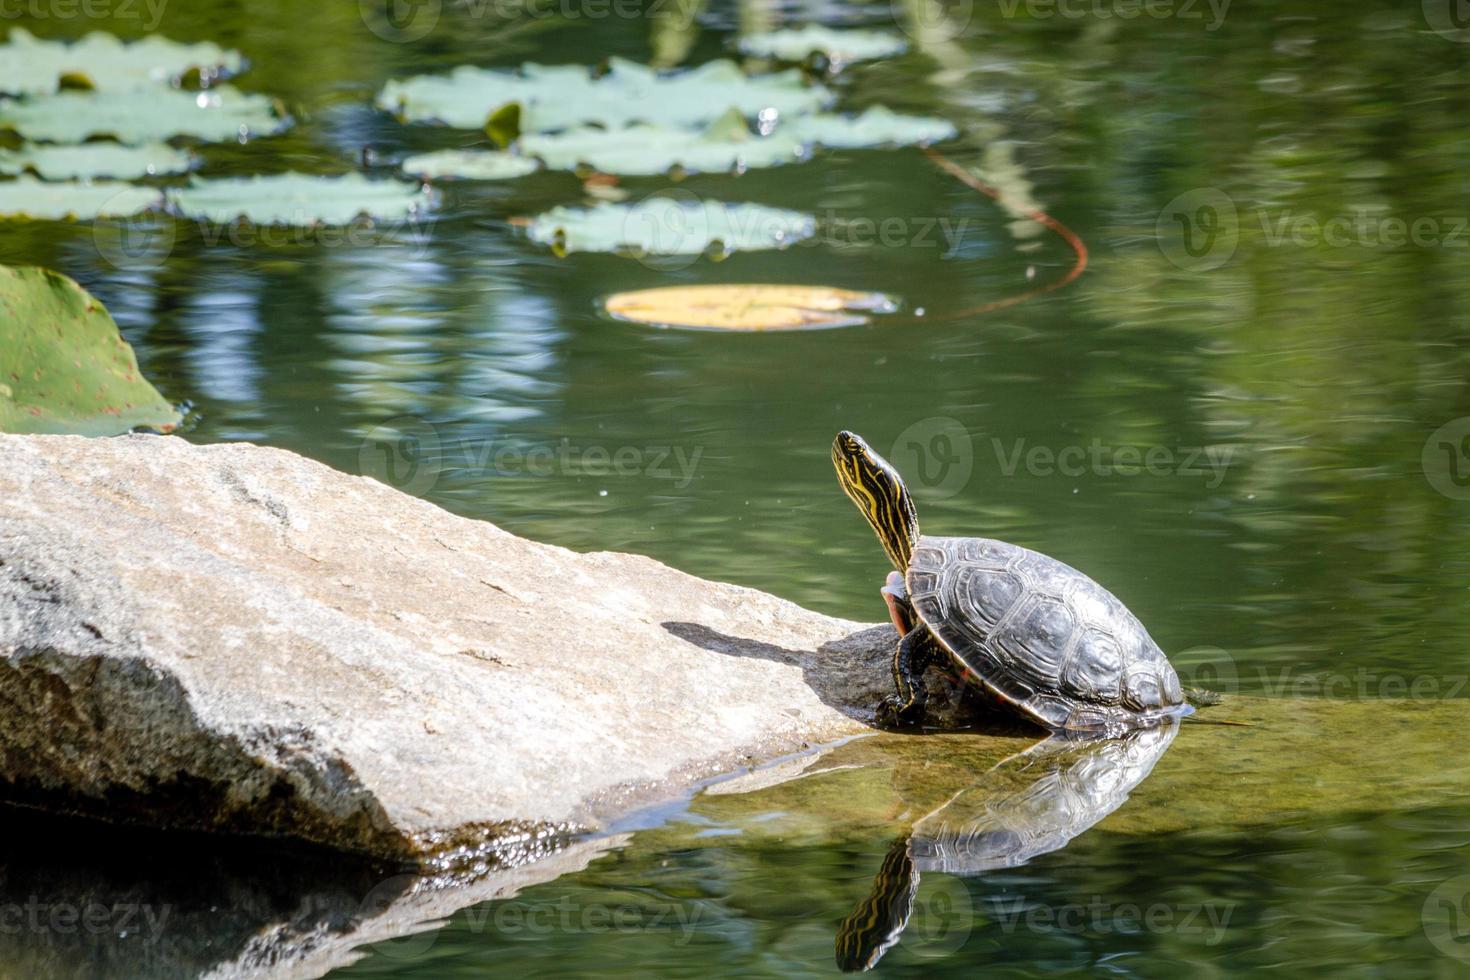 tartaruga pintada ocidental na lagoa foto